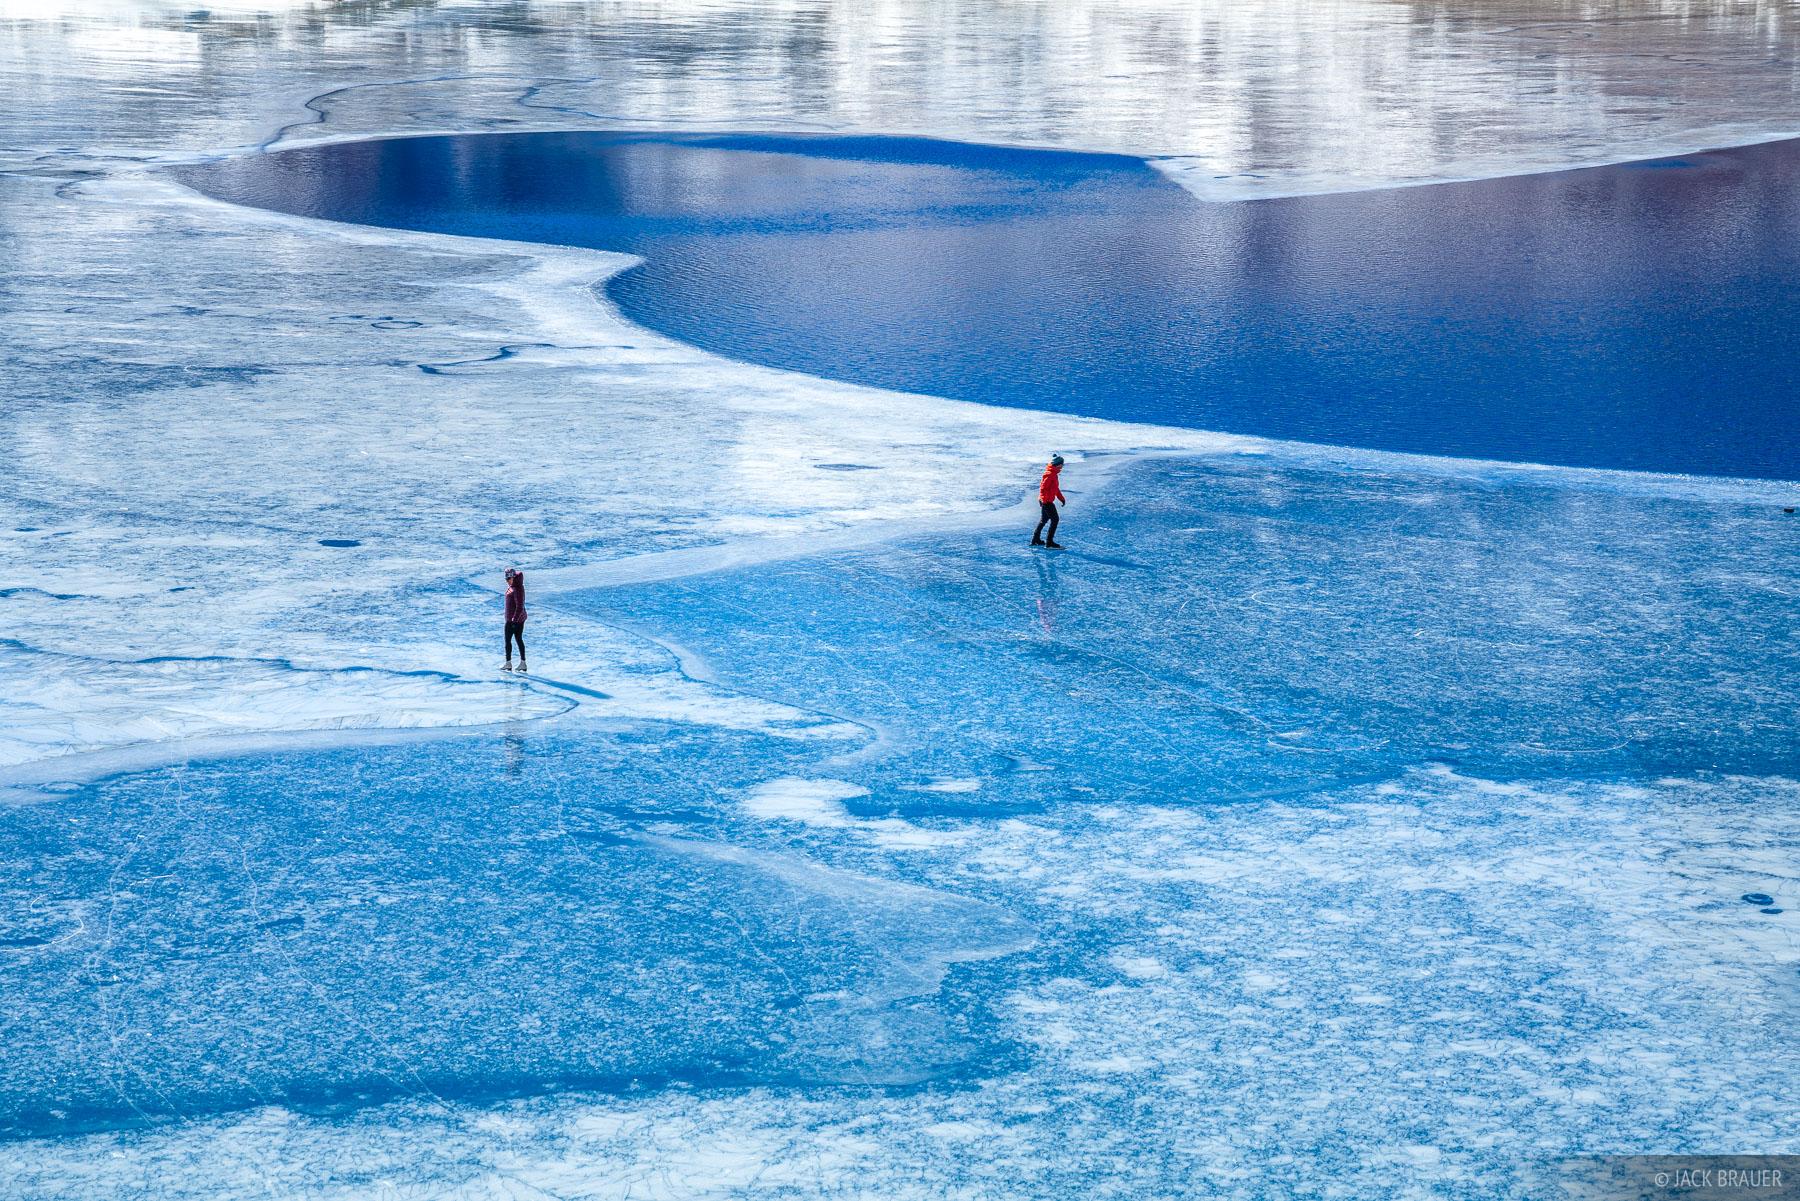 Ice skating on Ice Lake, November.